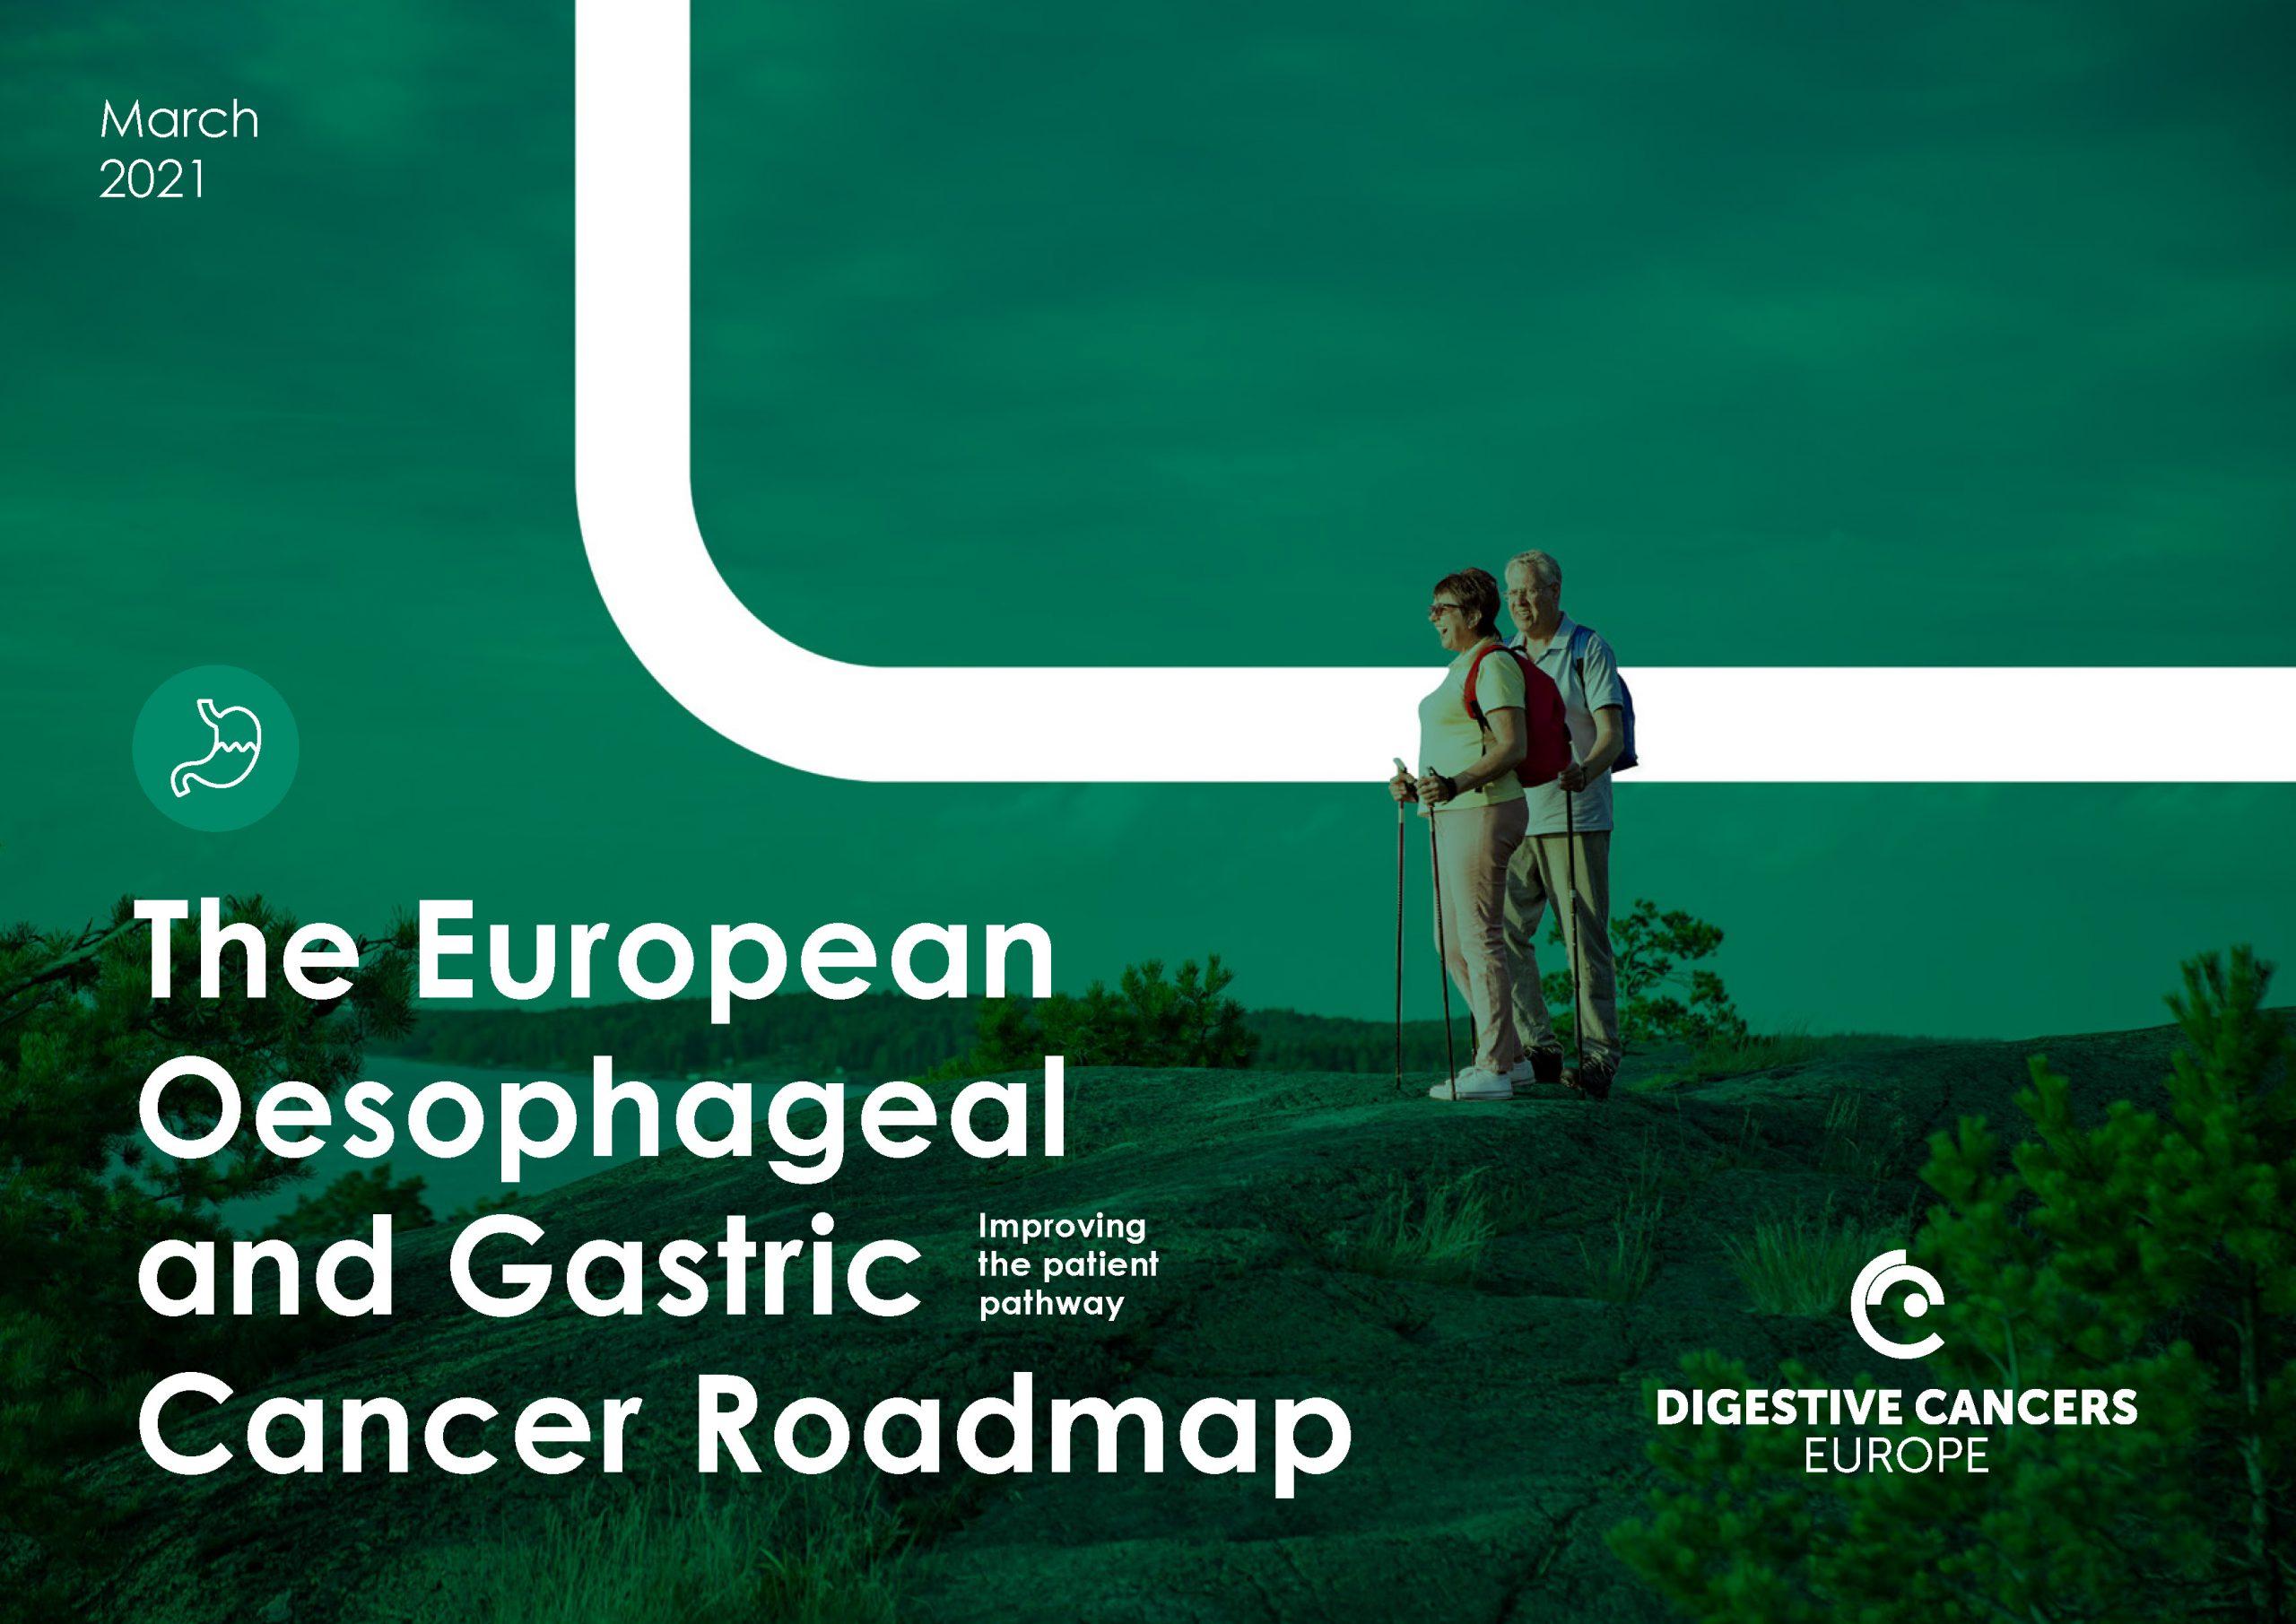 Oesophegeal Gastric Cancer Roadmap